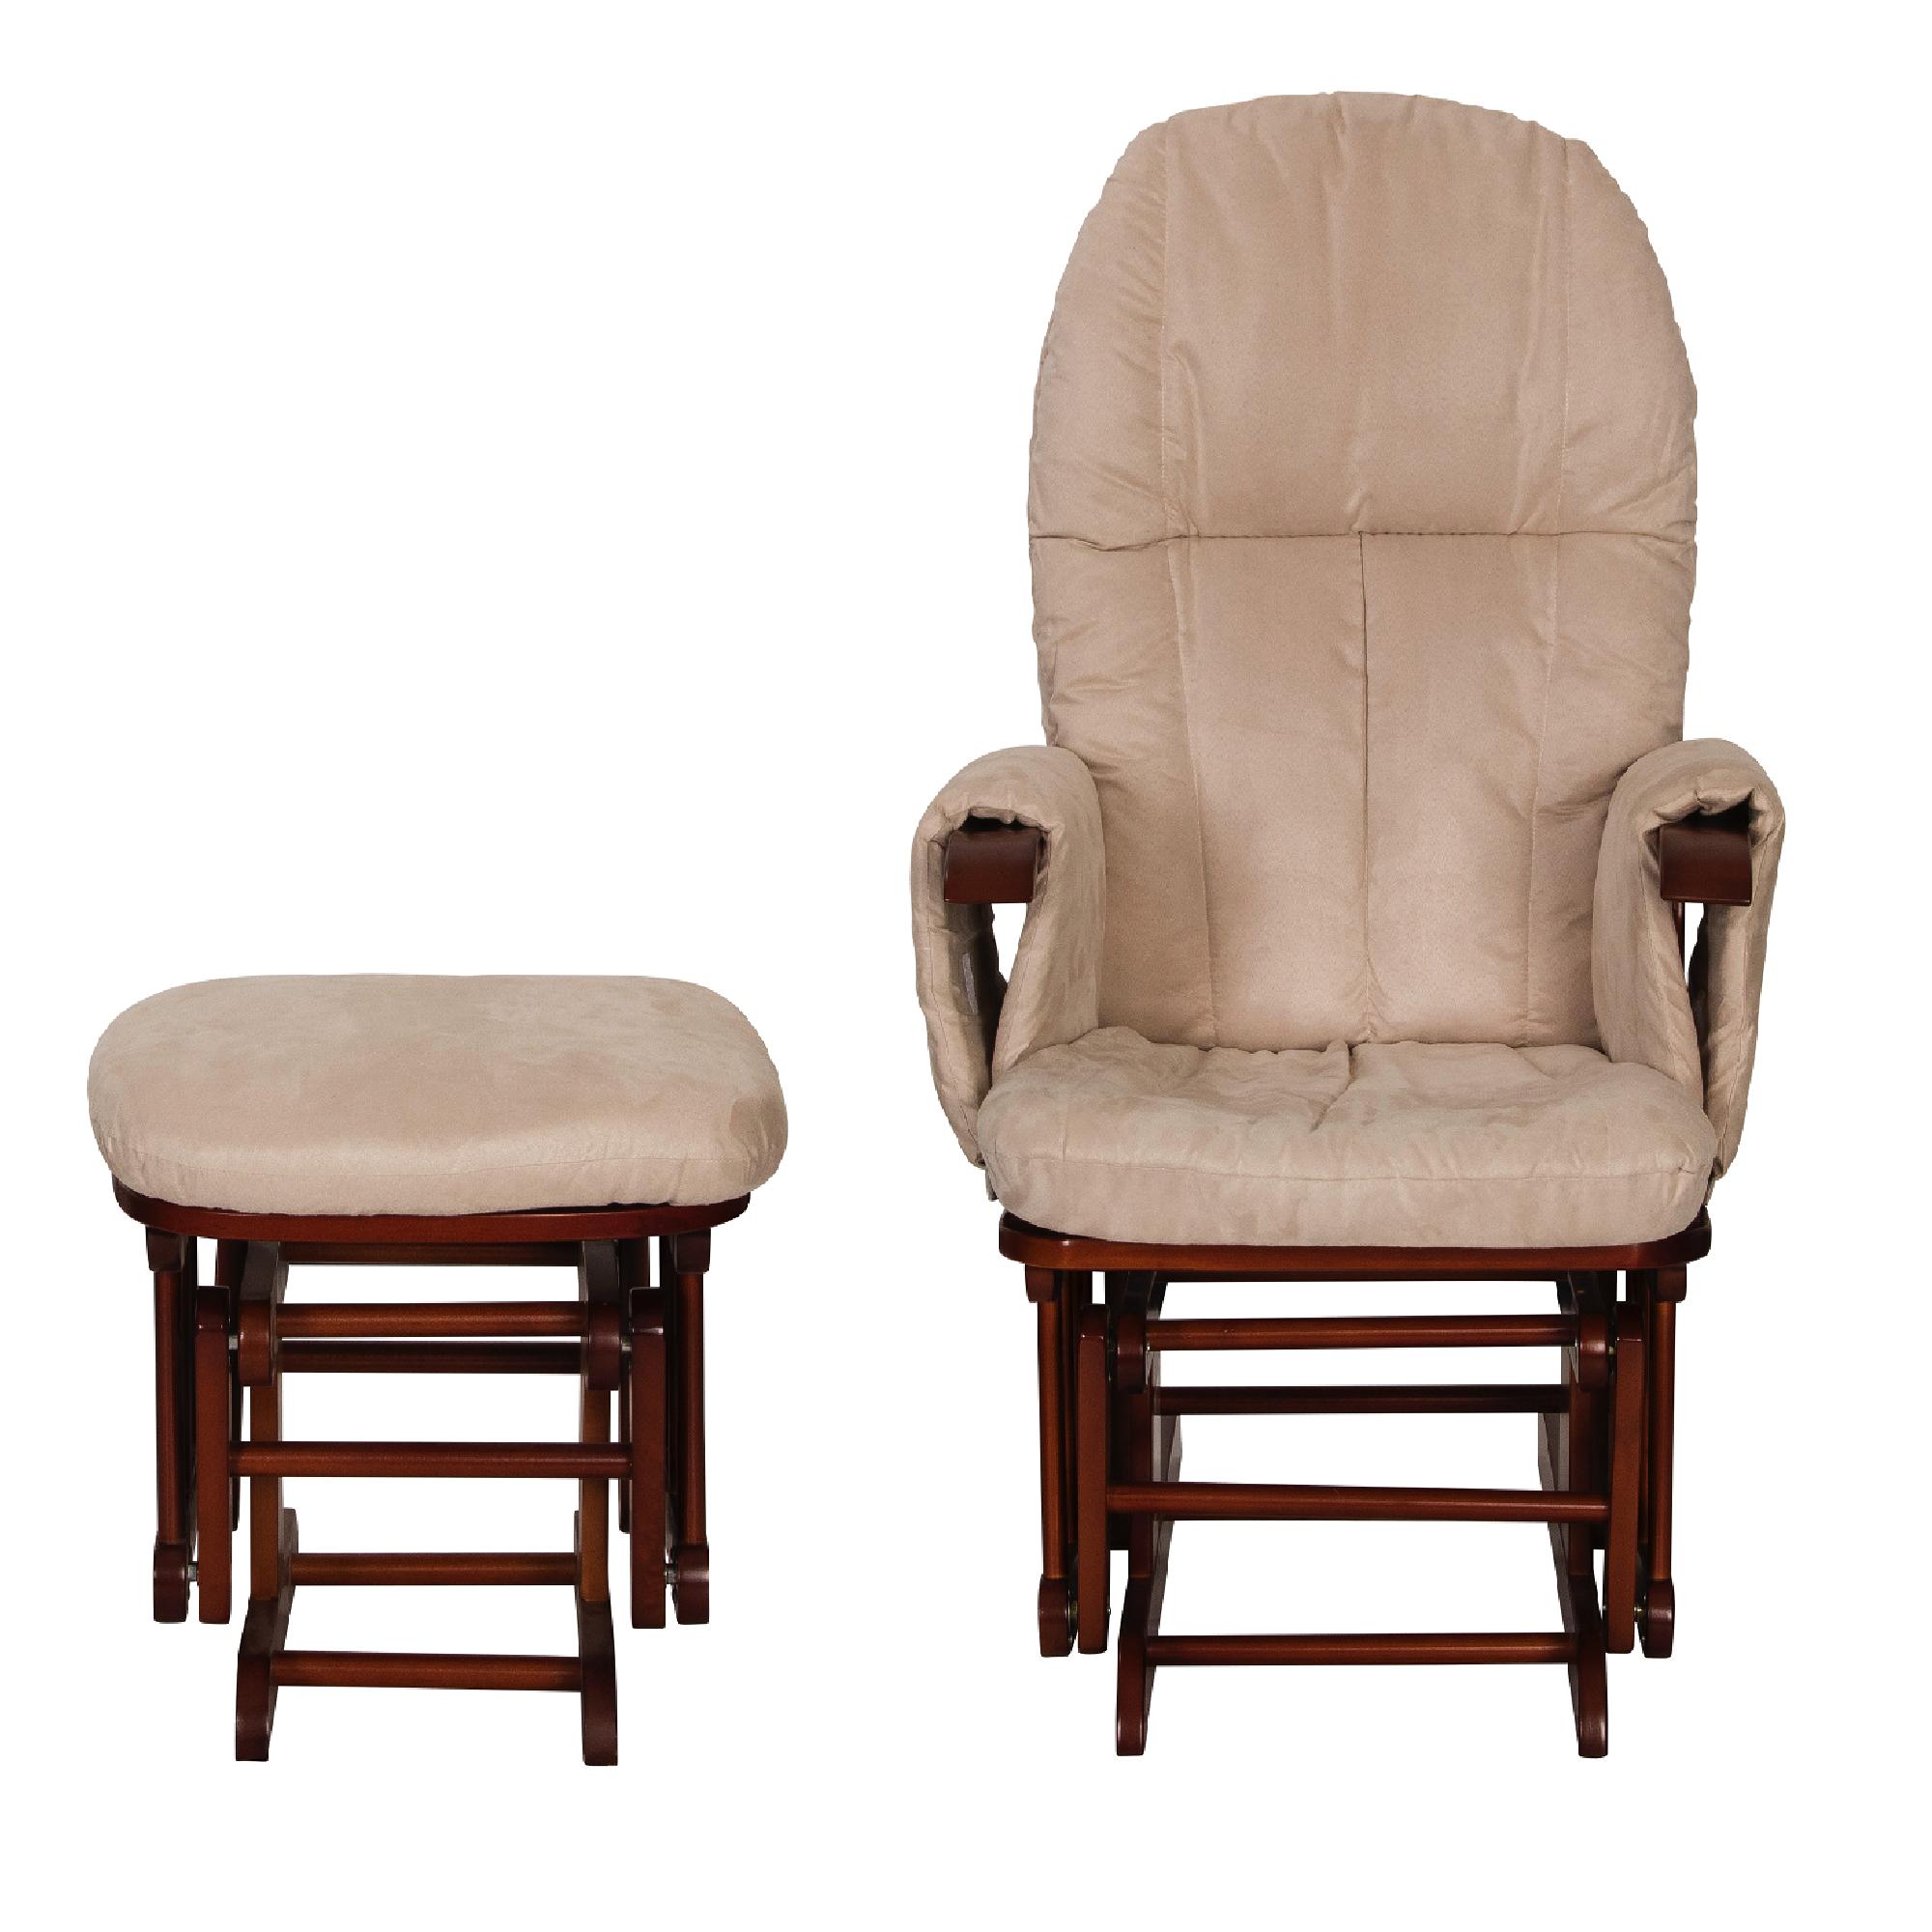 Tutti Bambini Reclining Glider Chair Stool Walnut With Cream Cushions